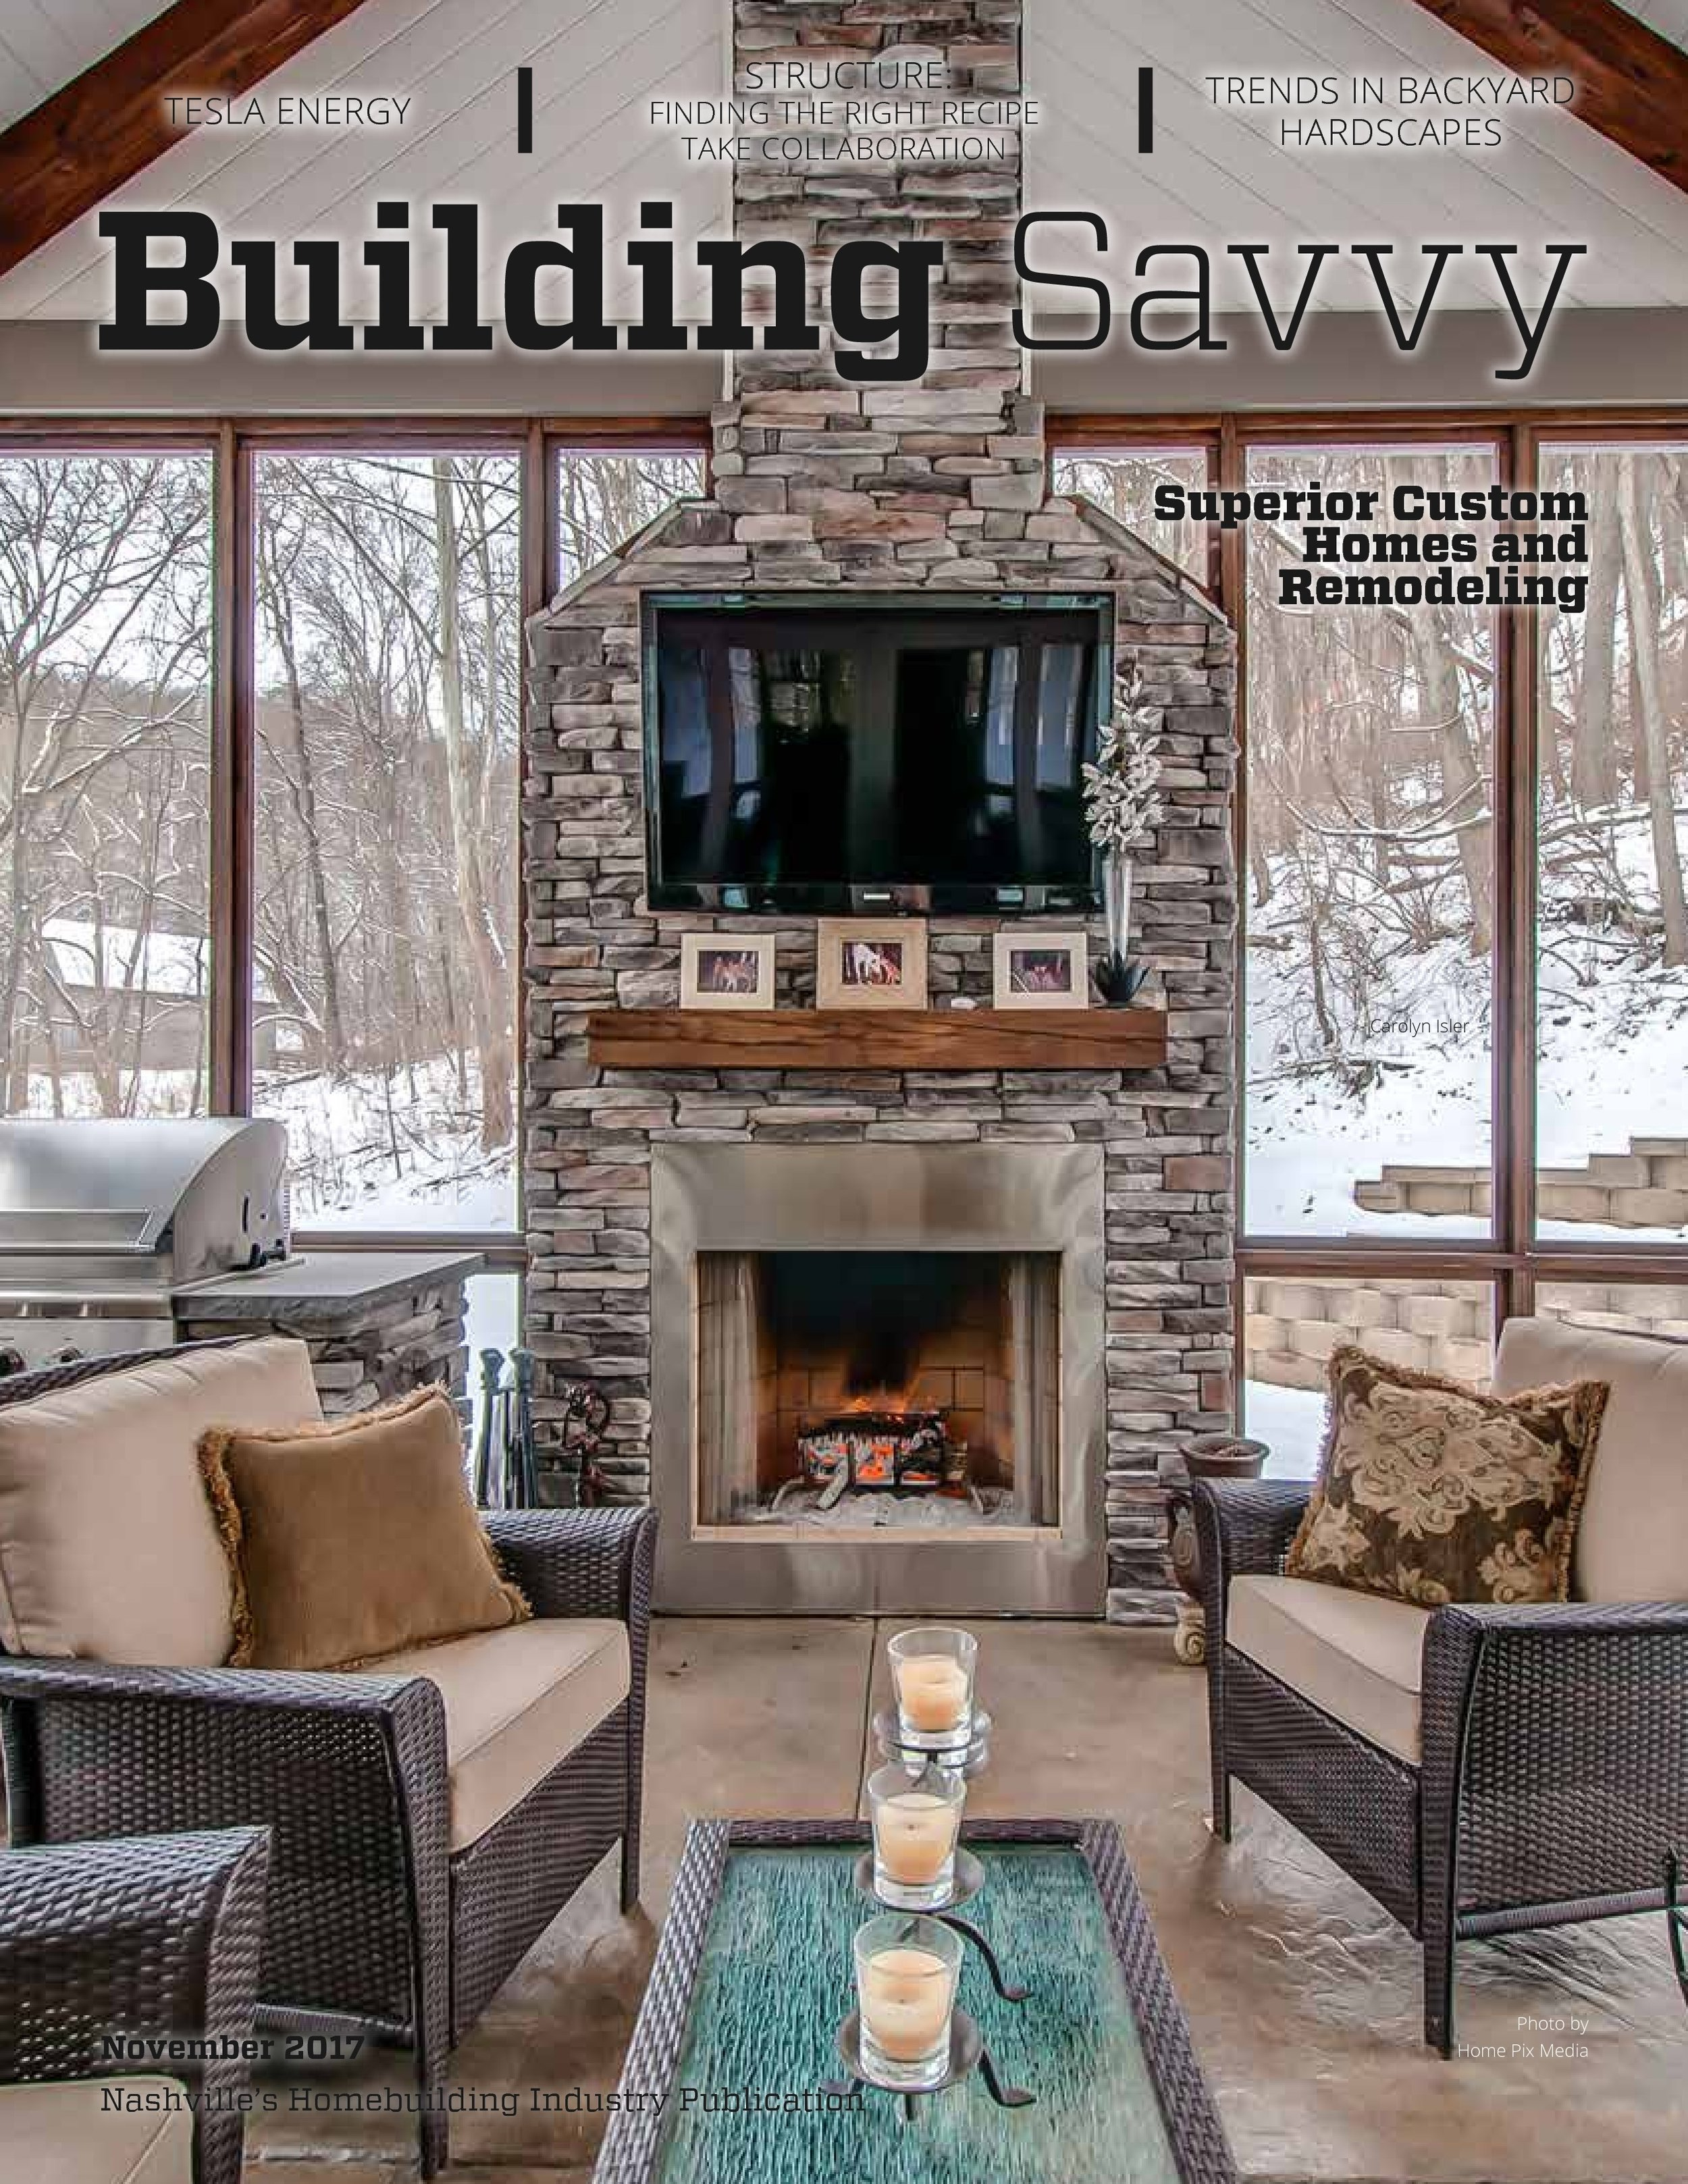 Nov_2017_TN_Nashville_Building_Savvy_page_1.jpg